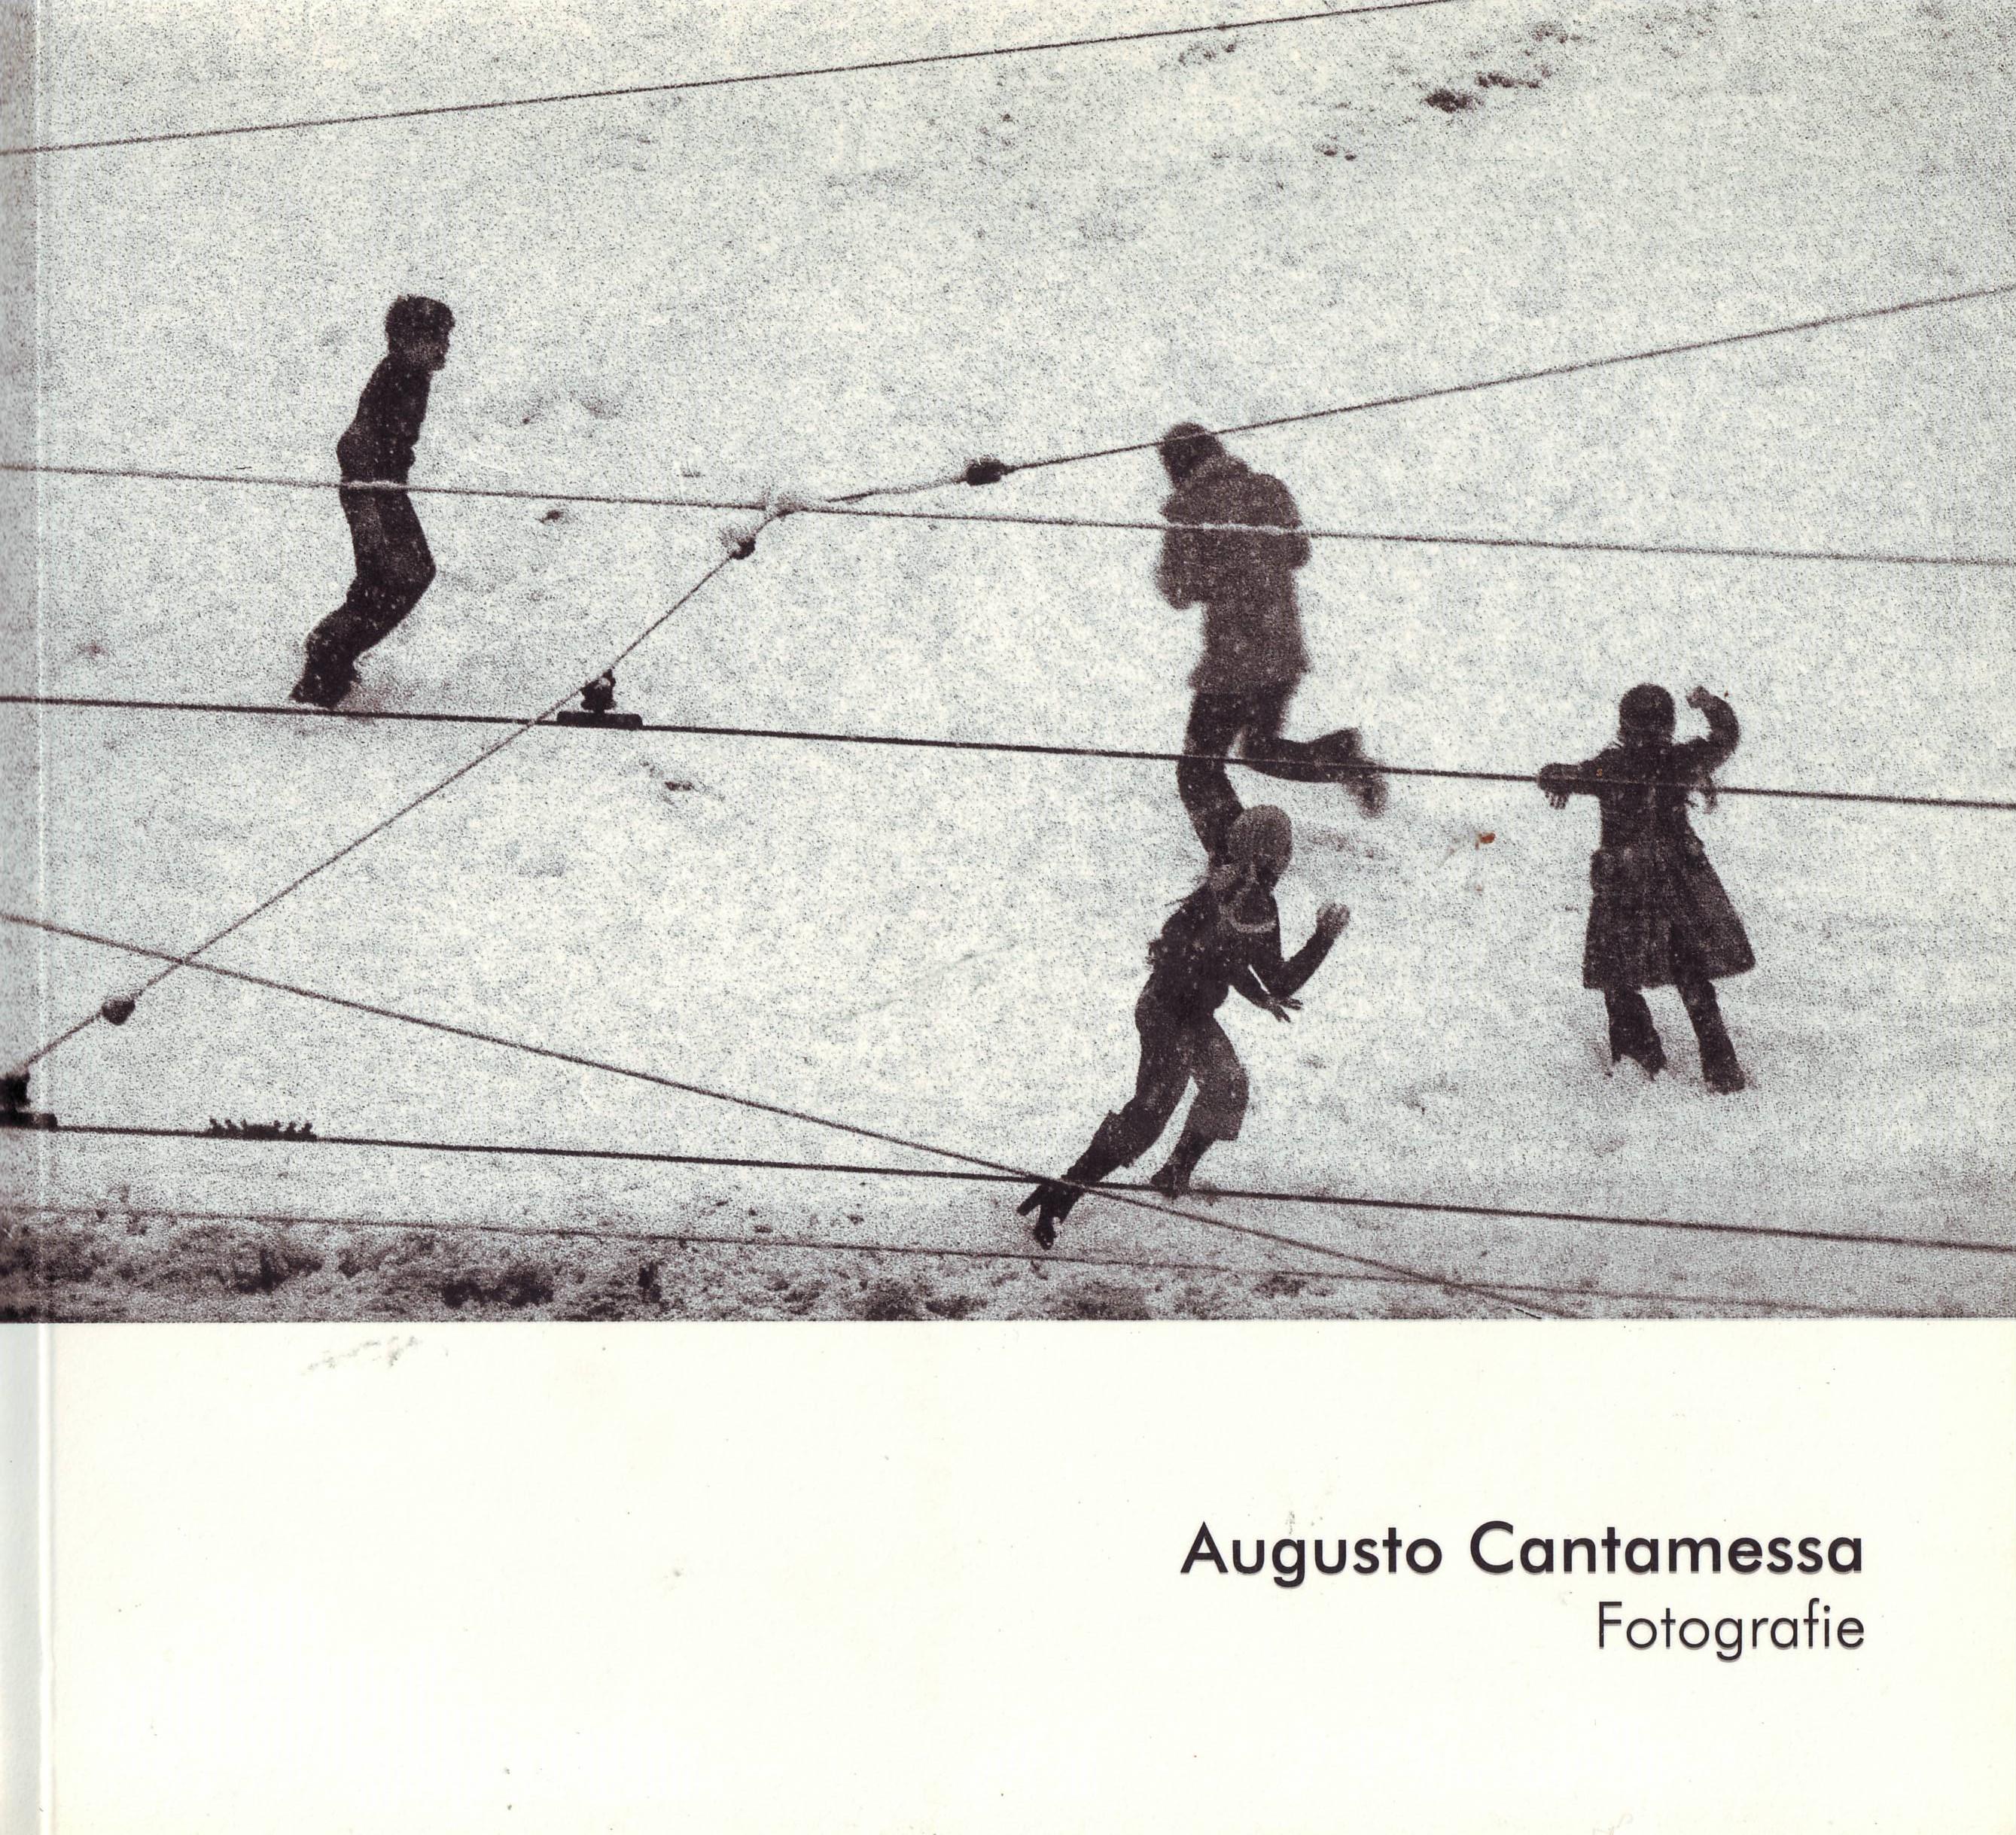 Augusto Cantamessa : fotografie